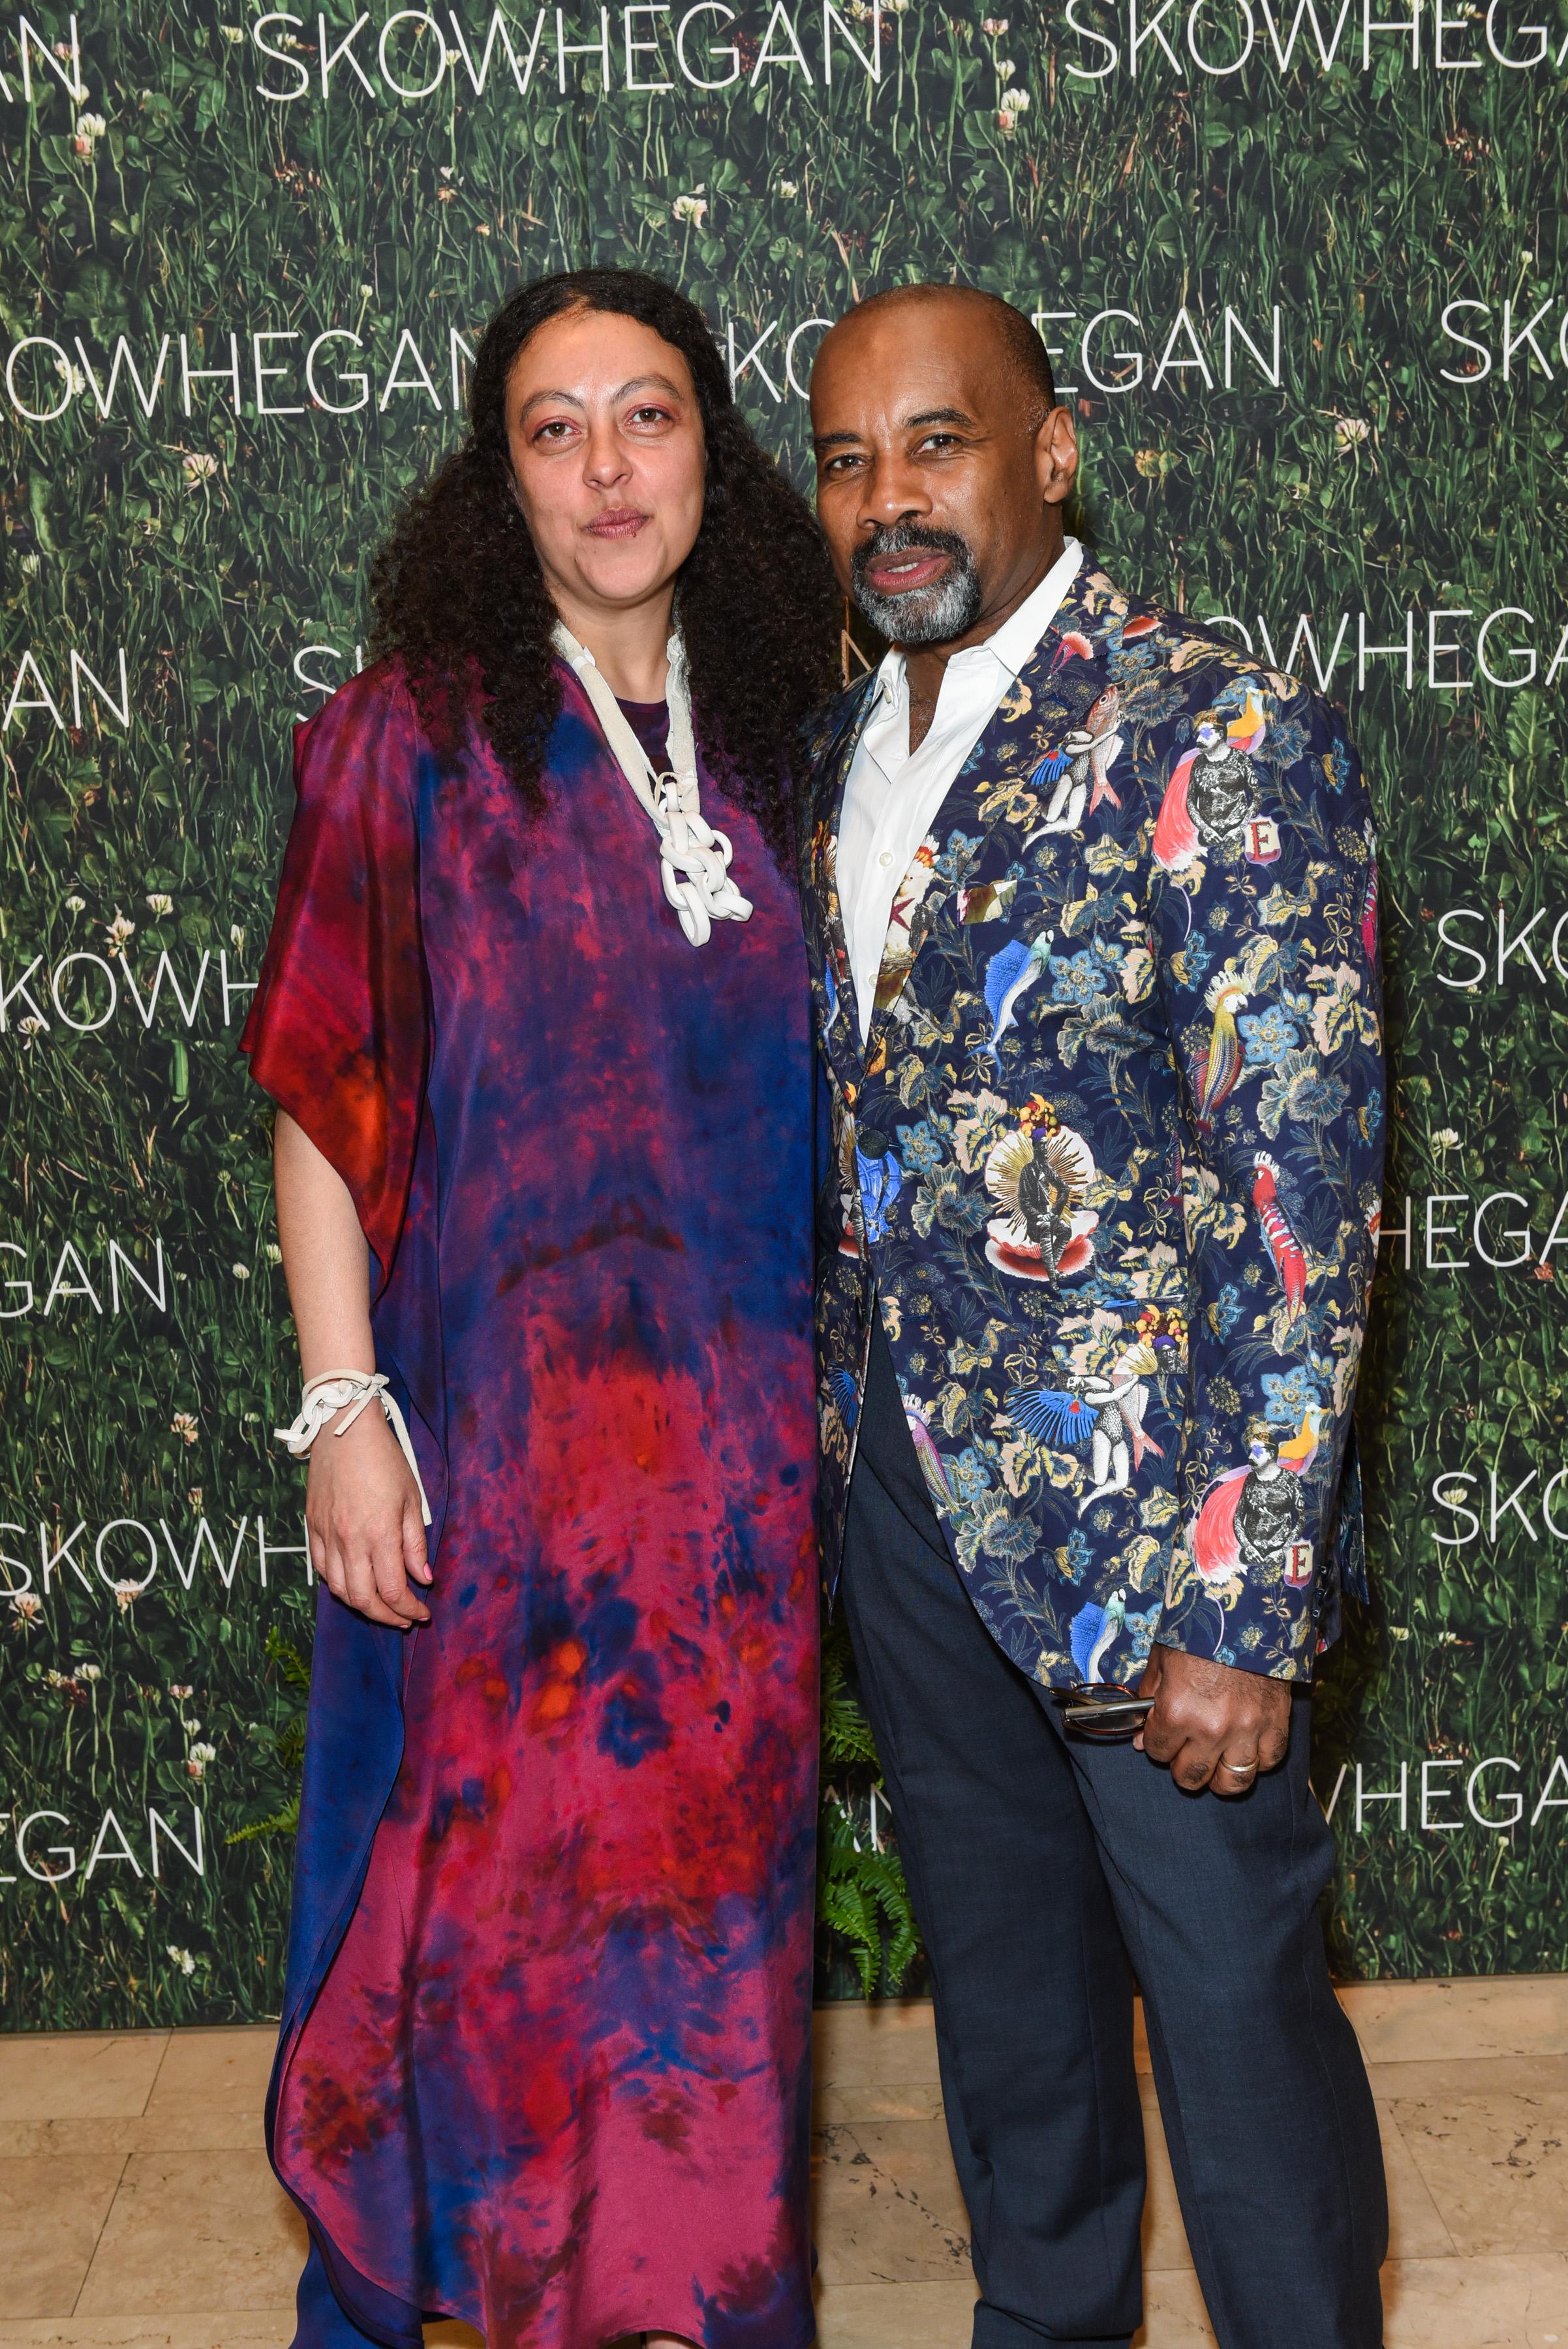 Sarah Workneh, Paul Kirnon==Skowhegan Awards Dinner 2018==The Plaza Hotel, New York, NY==April 24, 2018==�Patrick McMullan==Photo - Presley Ann/PMC====